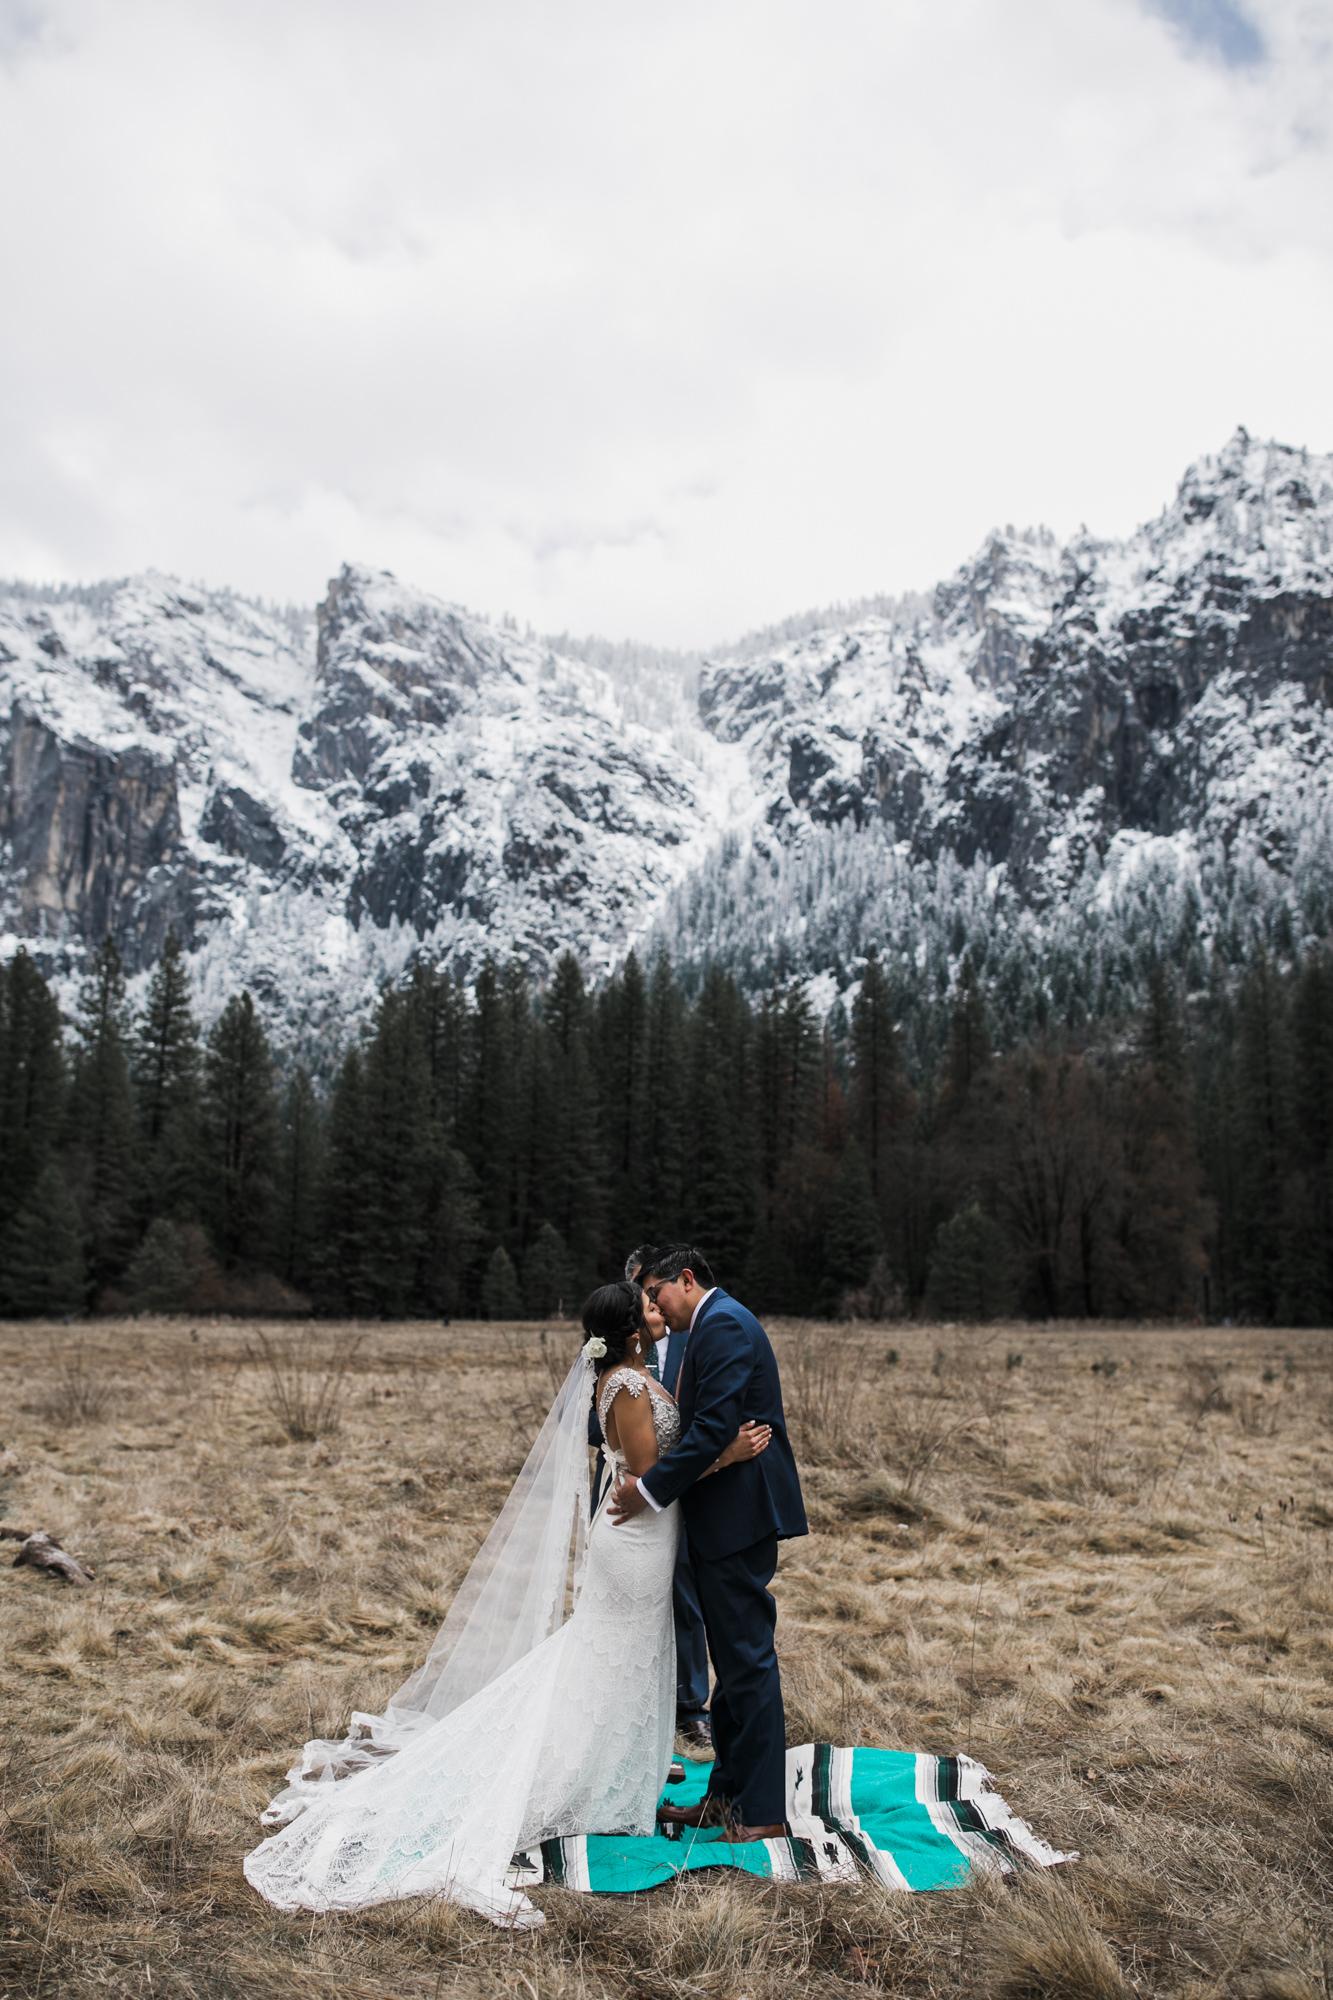 yosemite national park elopement inspiration | adventurous destination wedding photographer